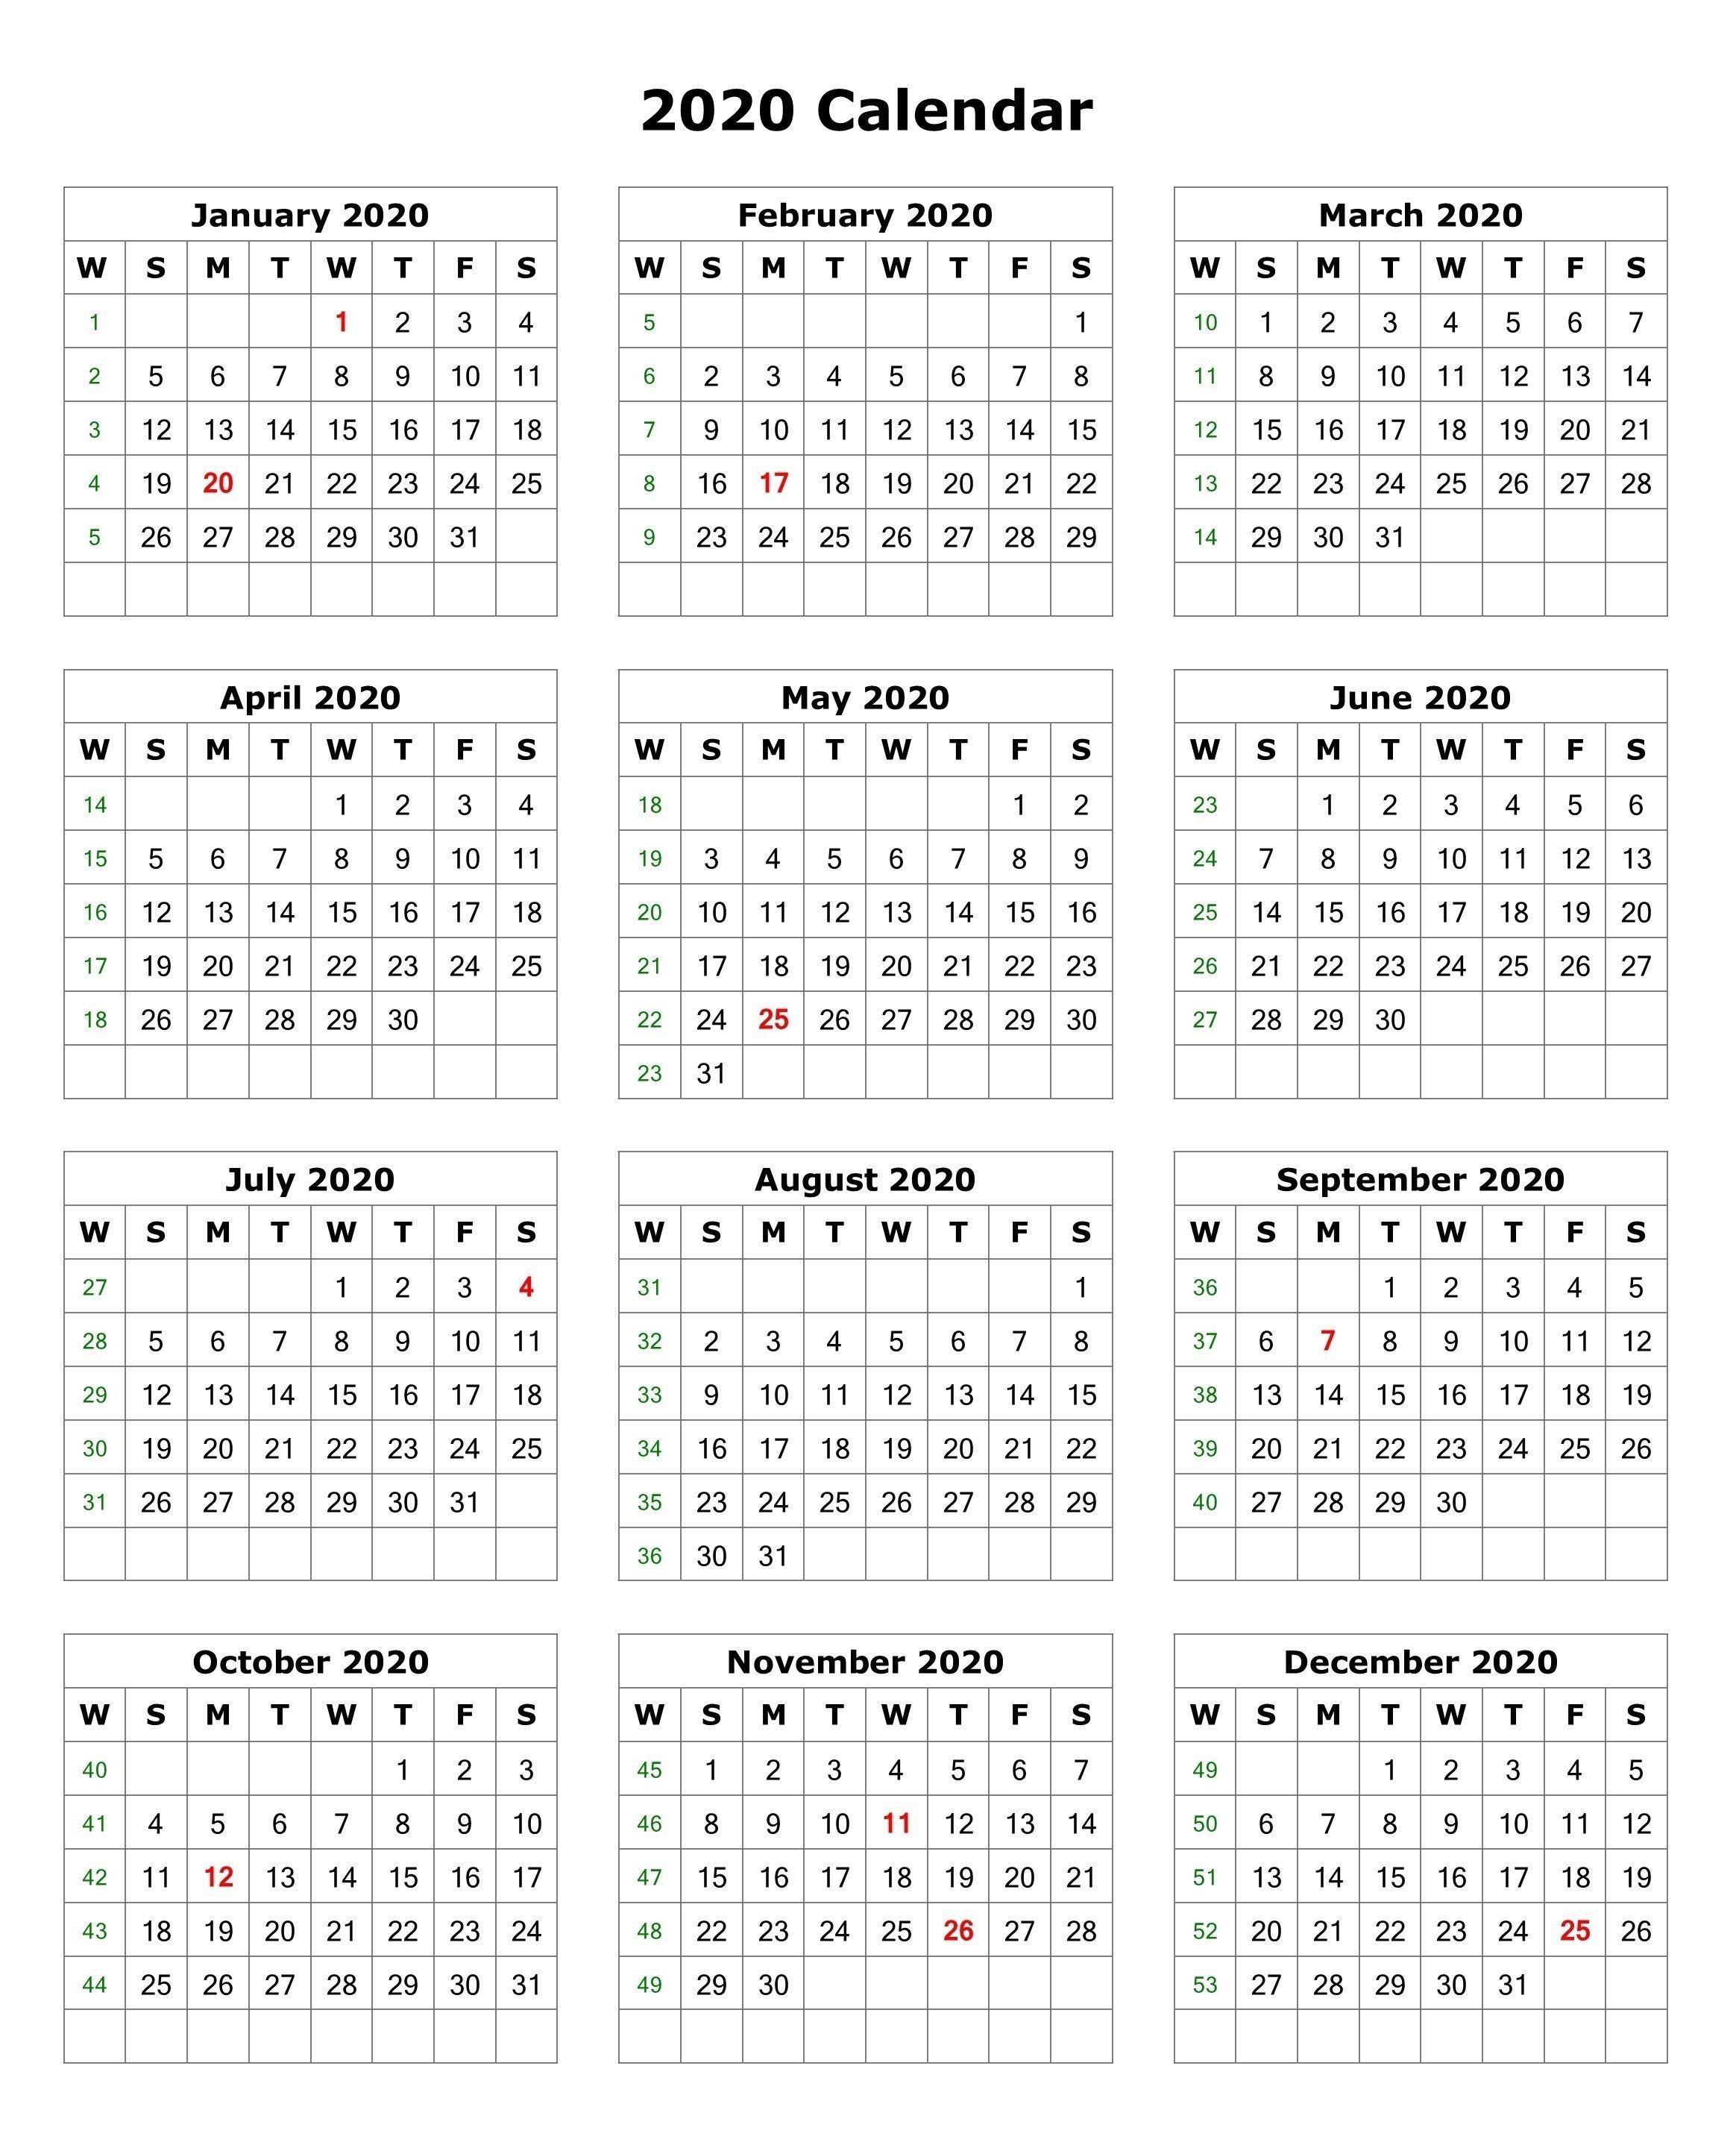 2020 One Page Portrait Calendar | 2020 Calendars | Monthly-6 Month Calendar Template 2020